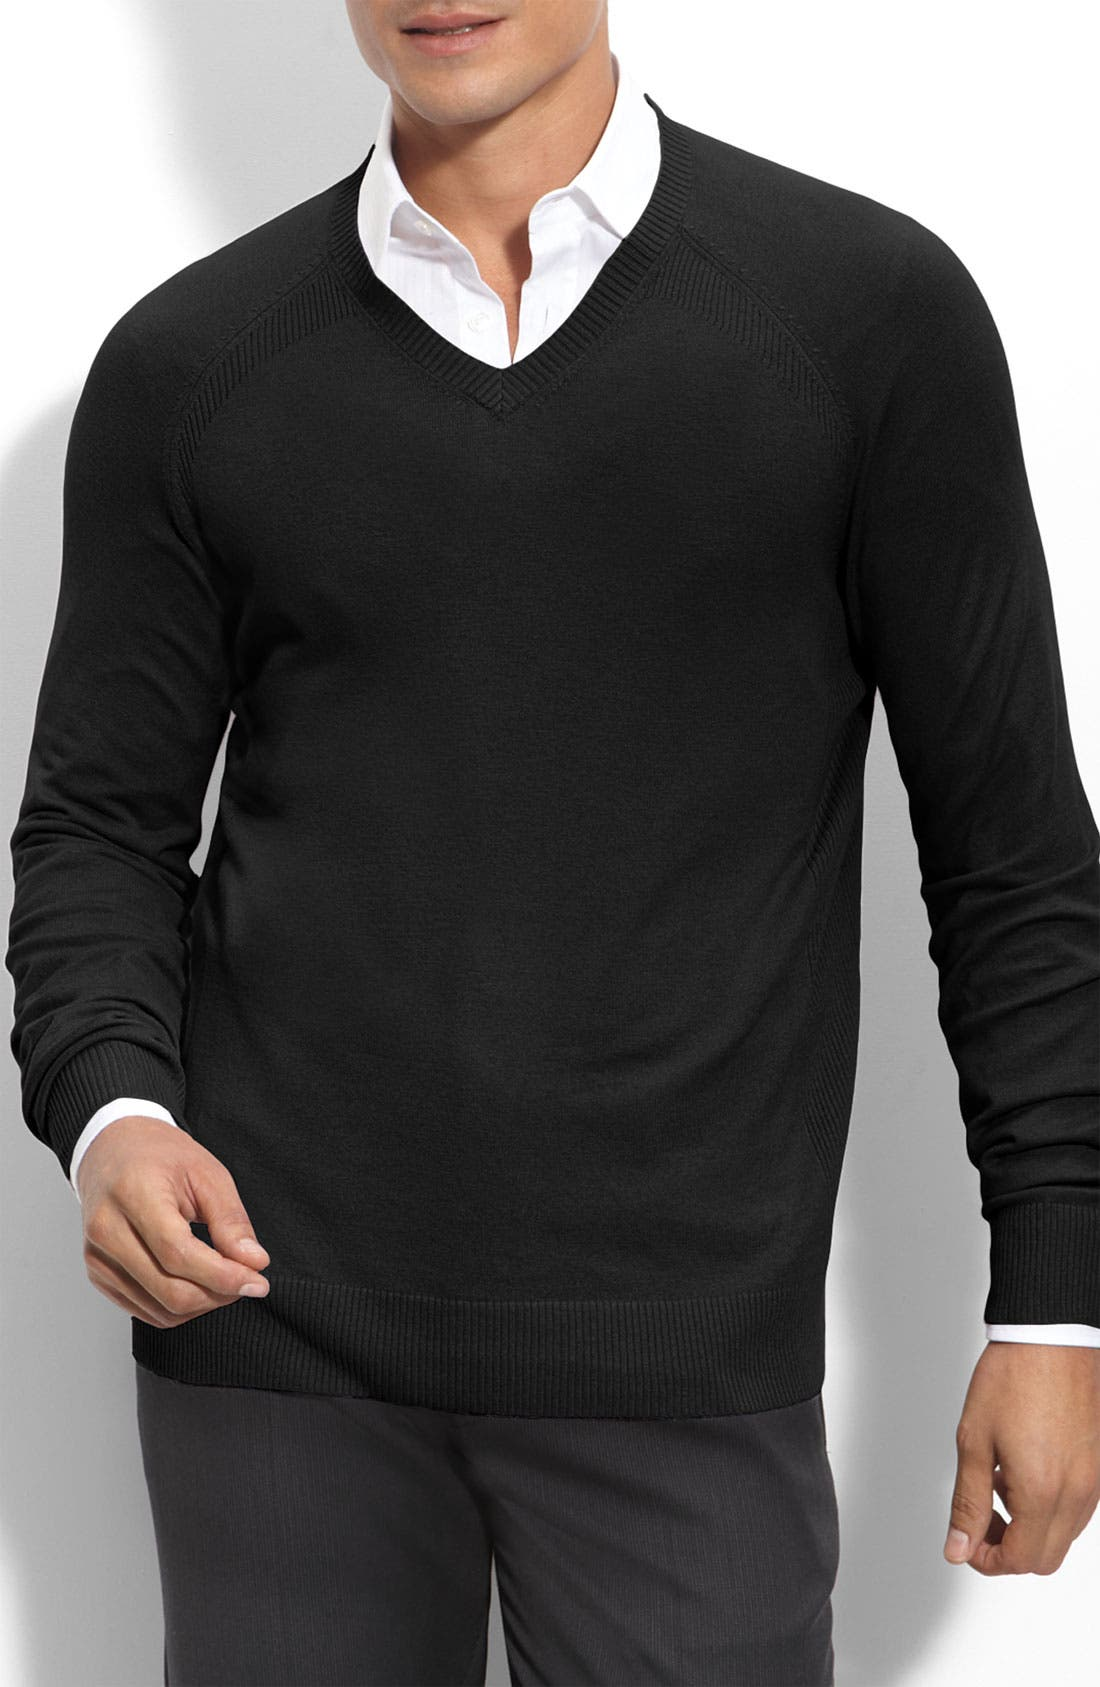 Alternate Image 1 Selected - Calibrate Trim Fit Cotton Blend V-Neck Sweater